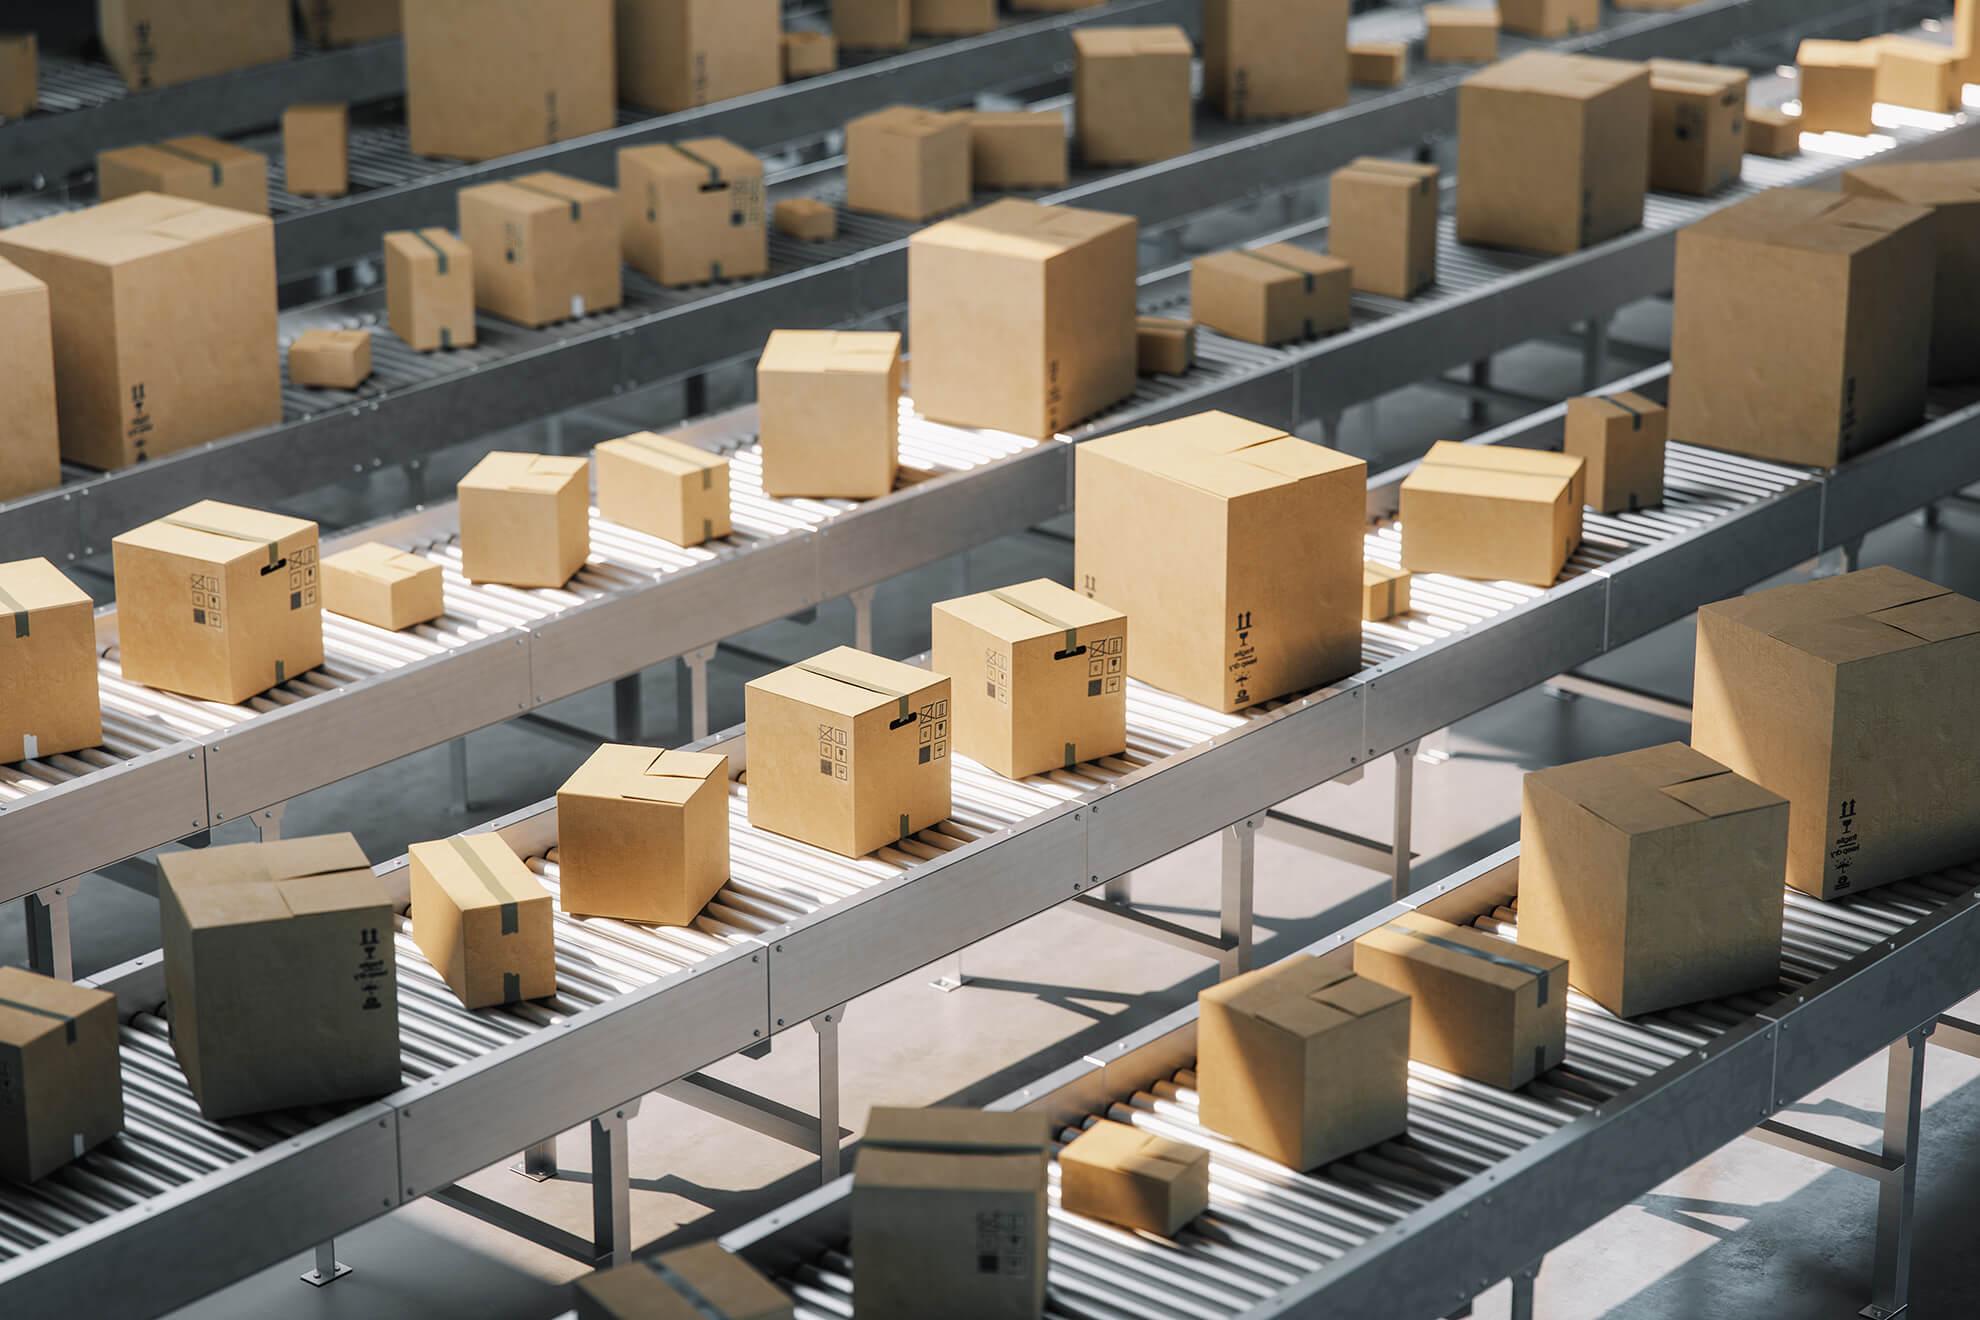 Boxes ready to ship